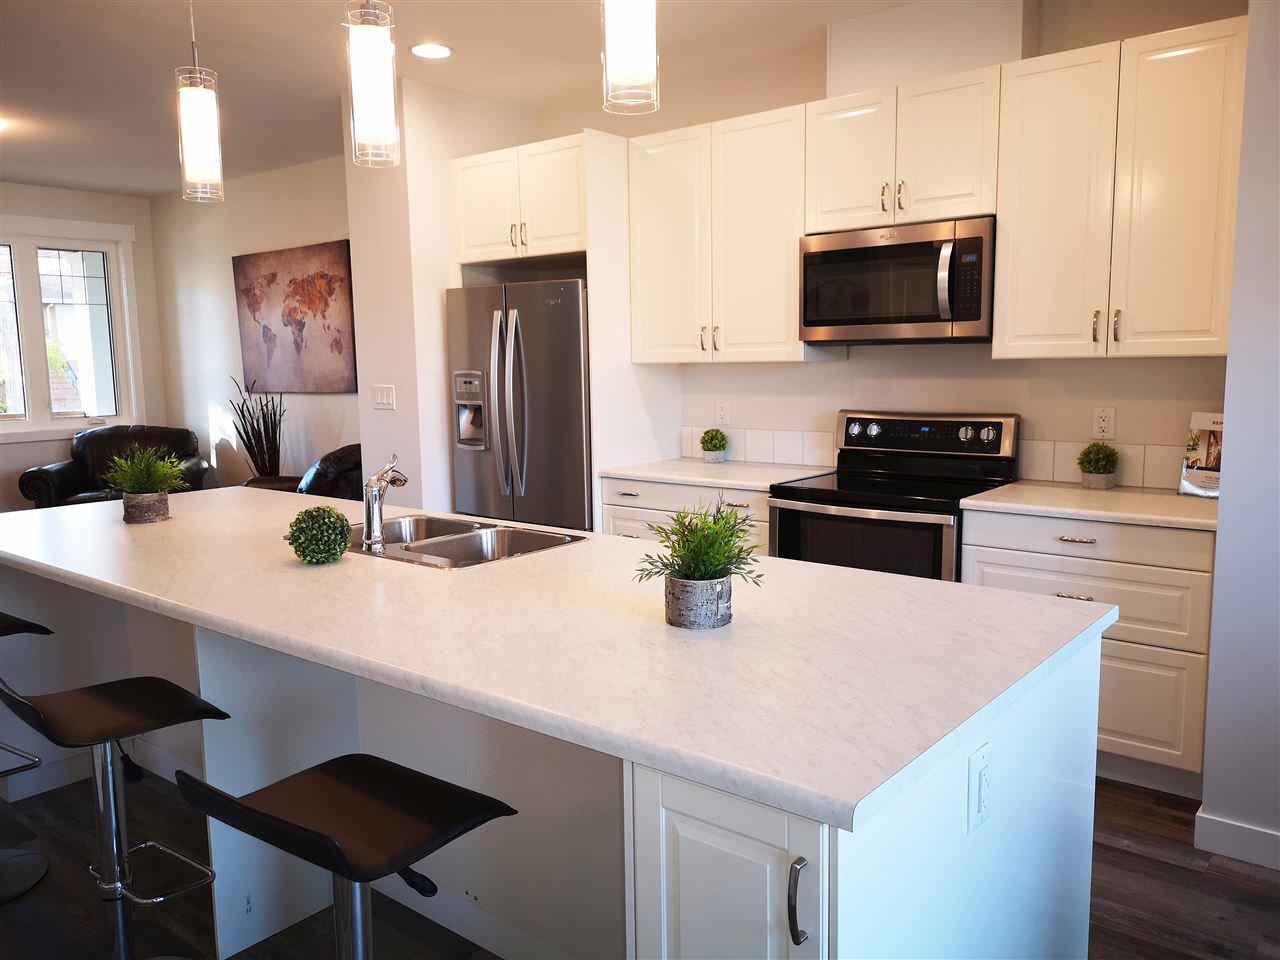 Main Photo: 11833 55 Street in Edmonton: Zone 06 House Half Duplex for sale : MLS®# E4159096